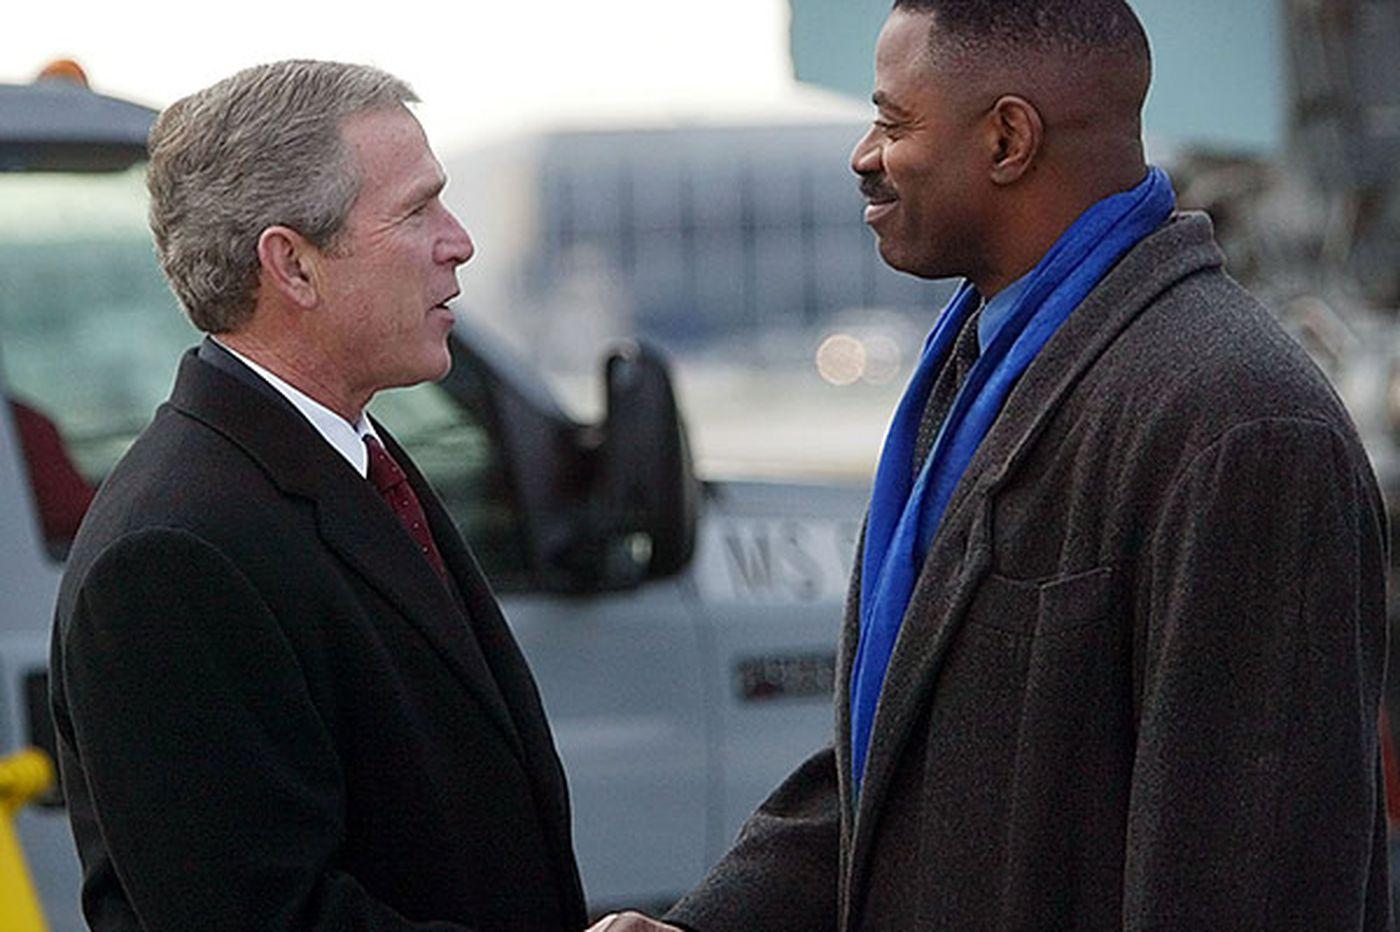 Former Eagles LB Garry Cobb eyeing run for Congress